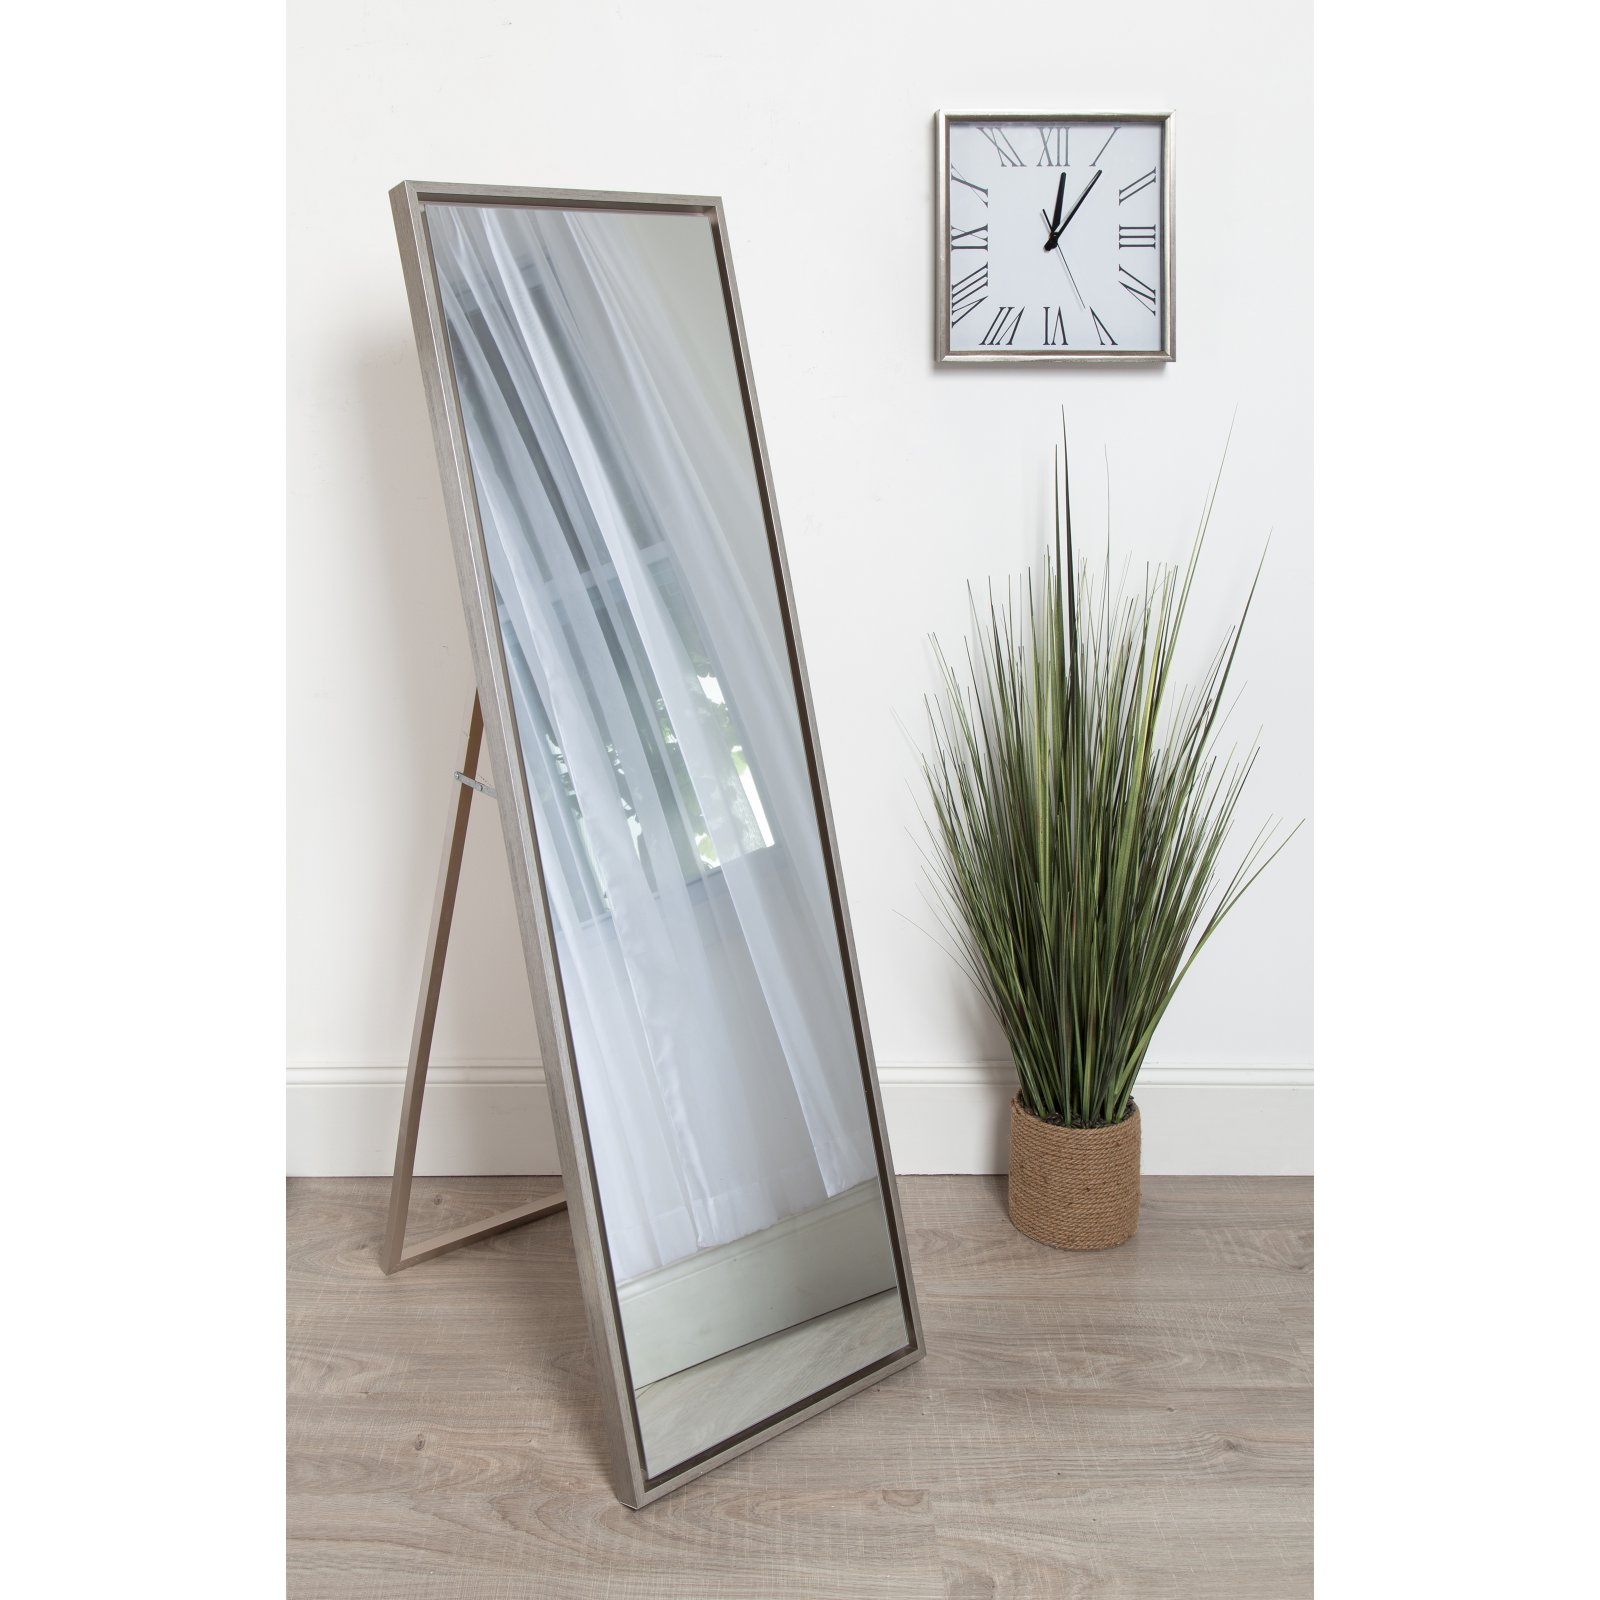 Wooden Mirror Stand Designs : Kate and laurel evans wood framed free standing floor mirror w